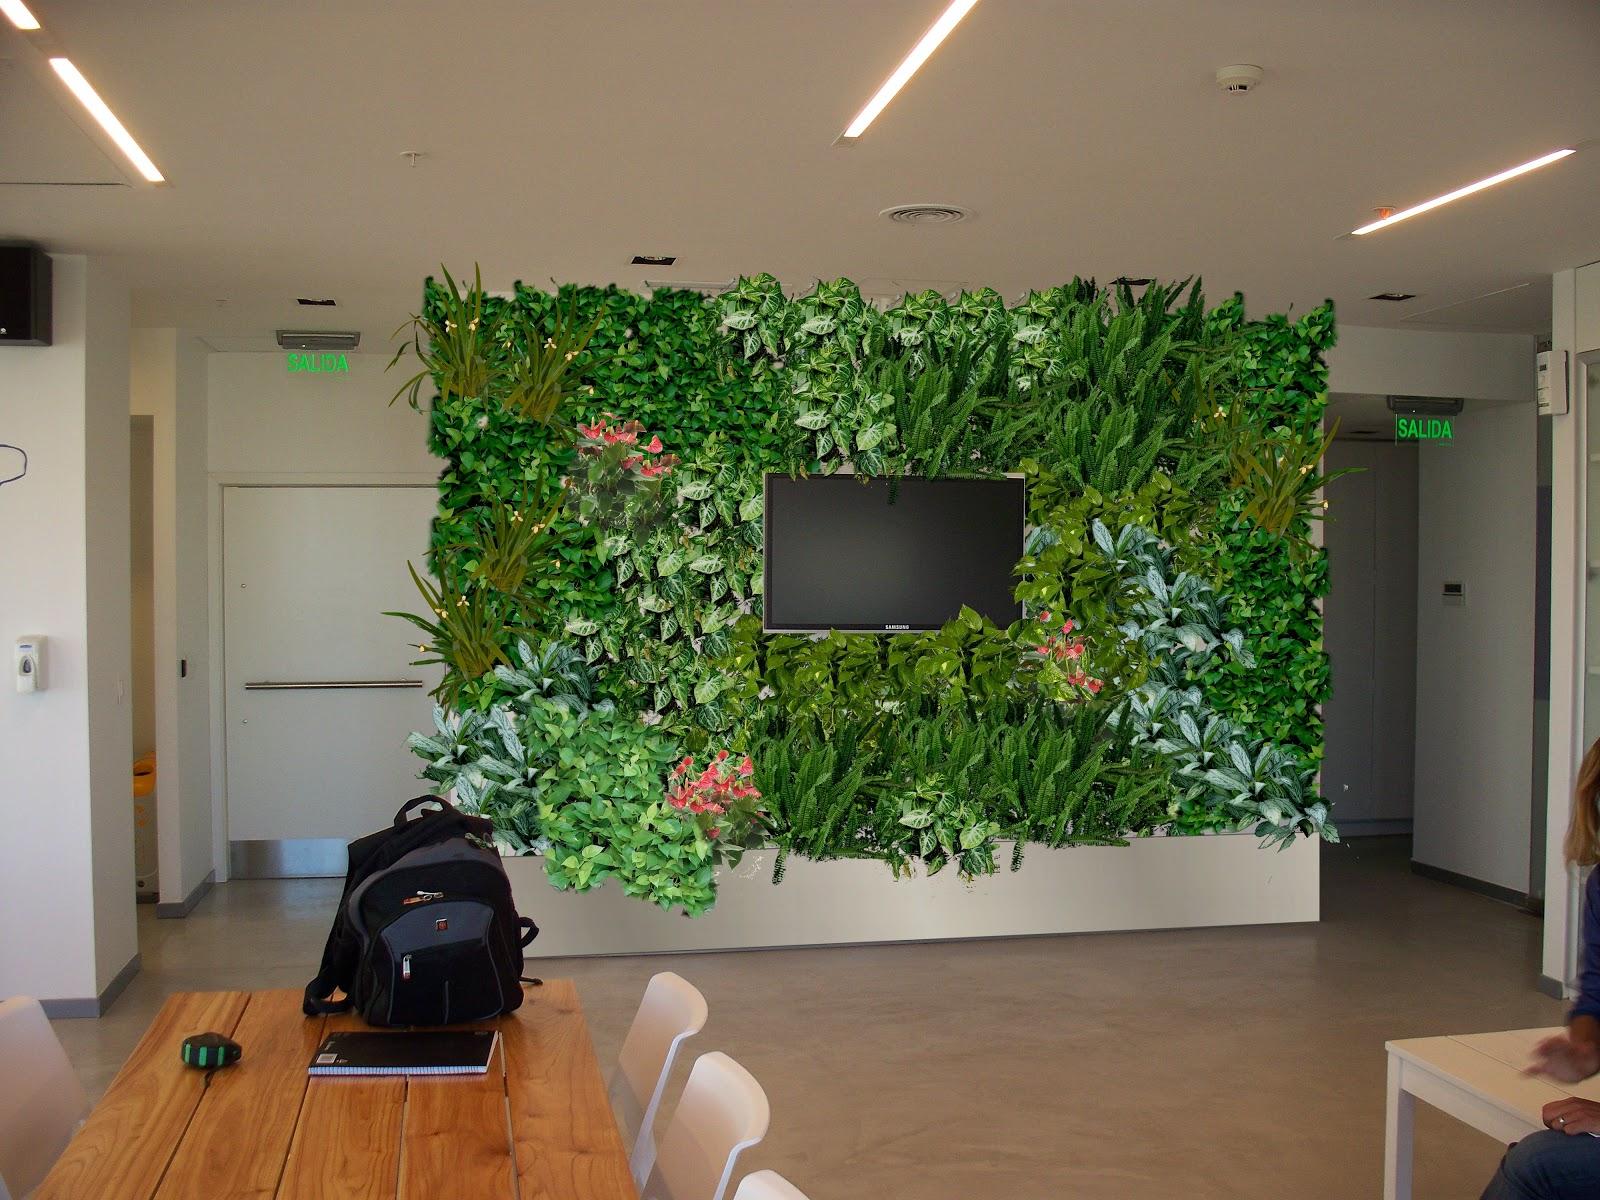 Jardines verticales monterrey dise o de jardines interiores - Diseno de jardines interiores ...